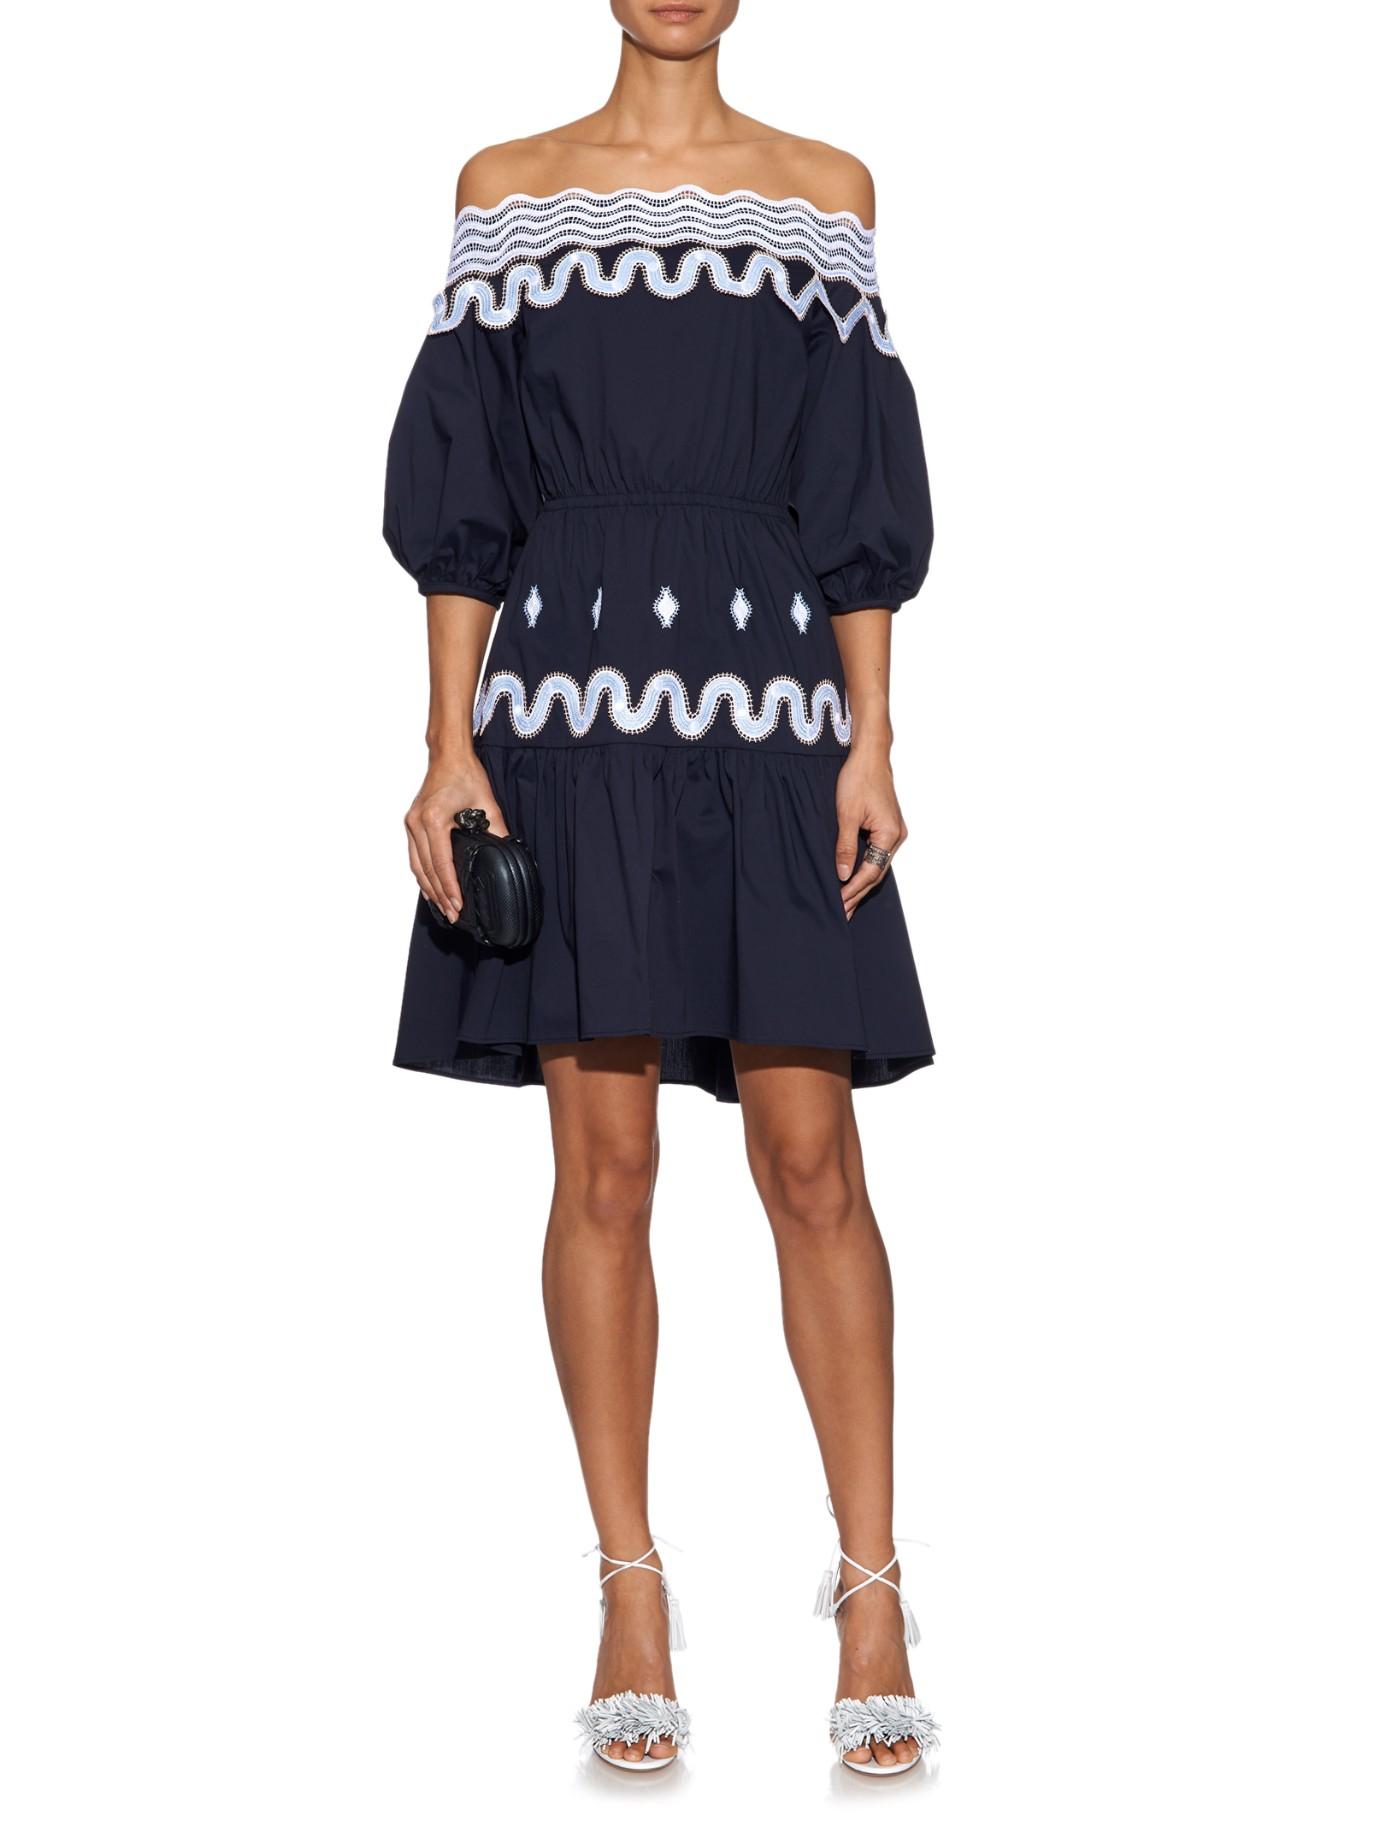 Velvet off-the-shoulder dress Peter Pilotto zS98E